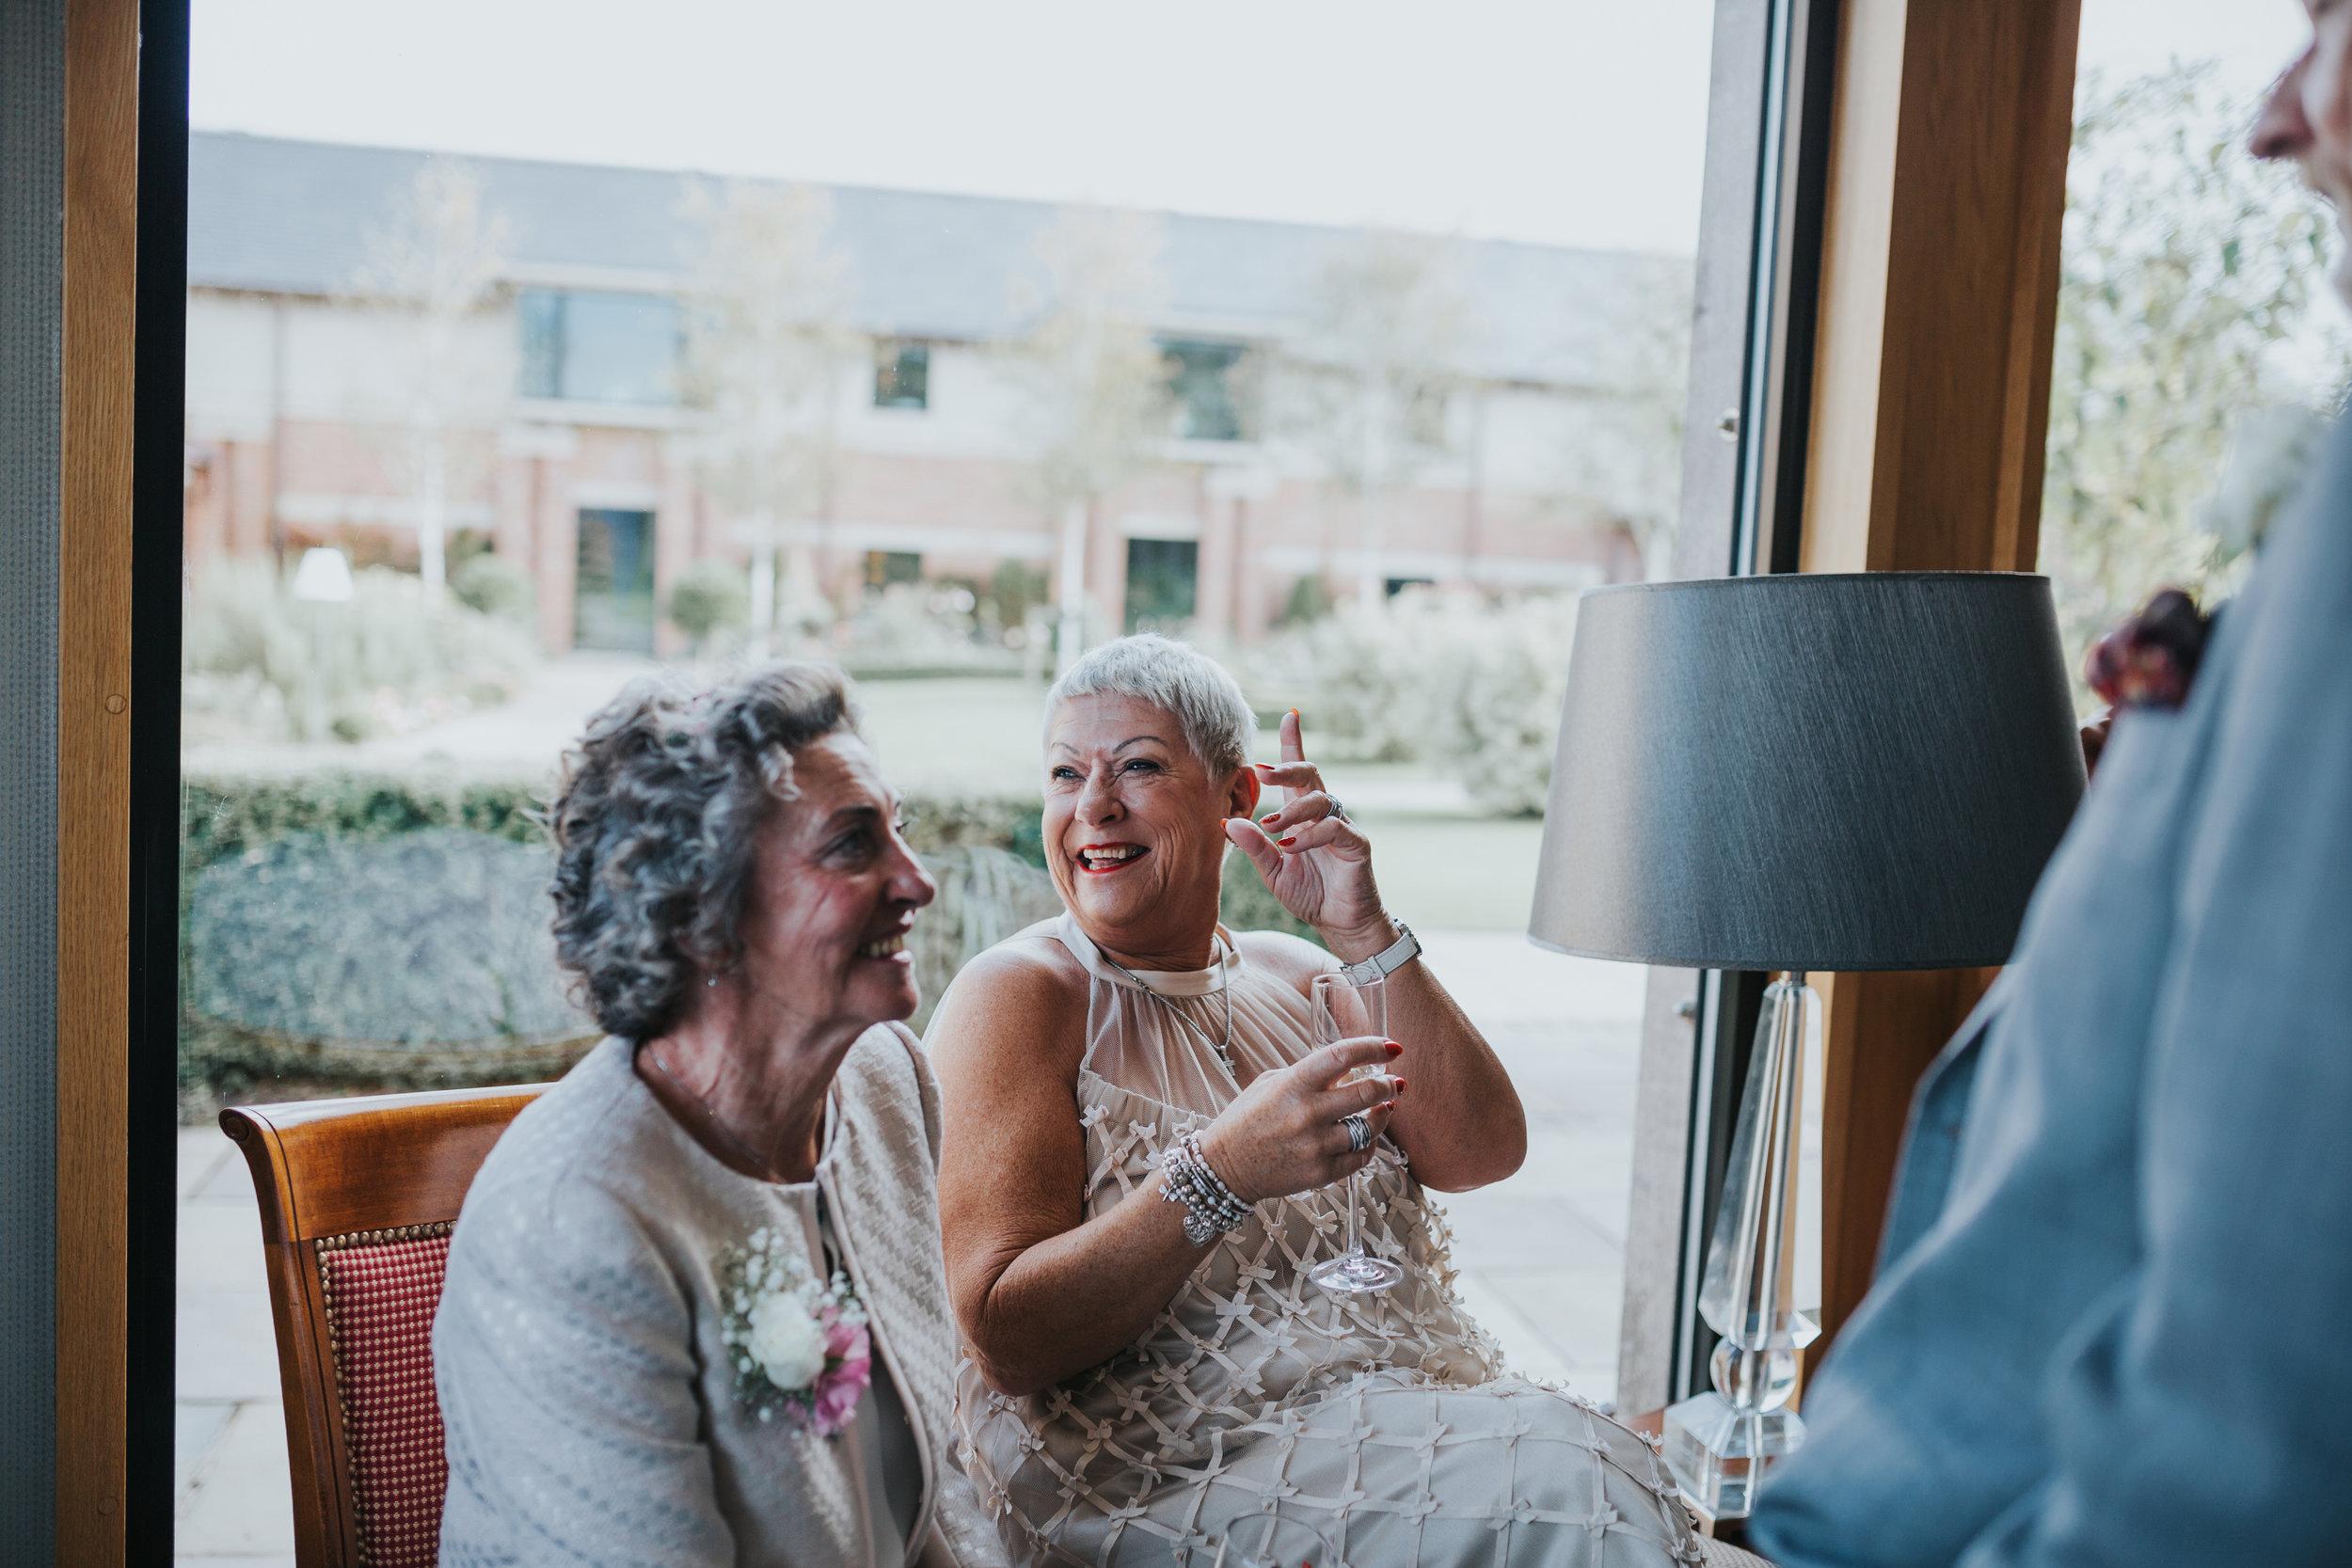 Wedding guest laughs.